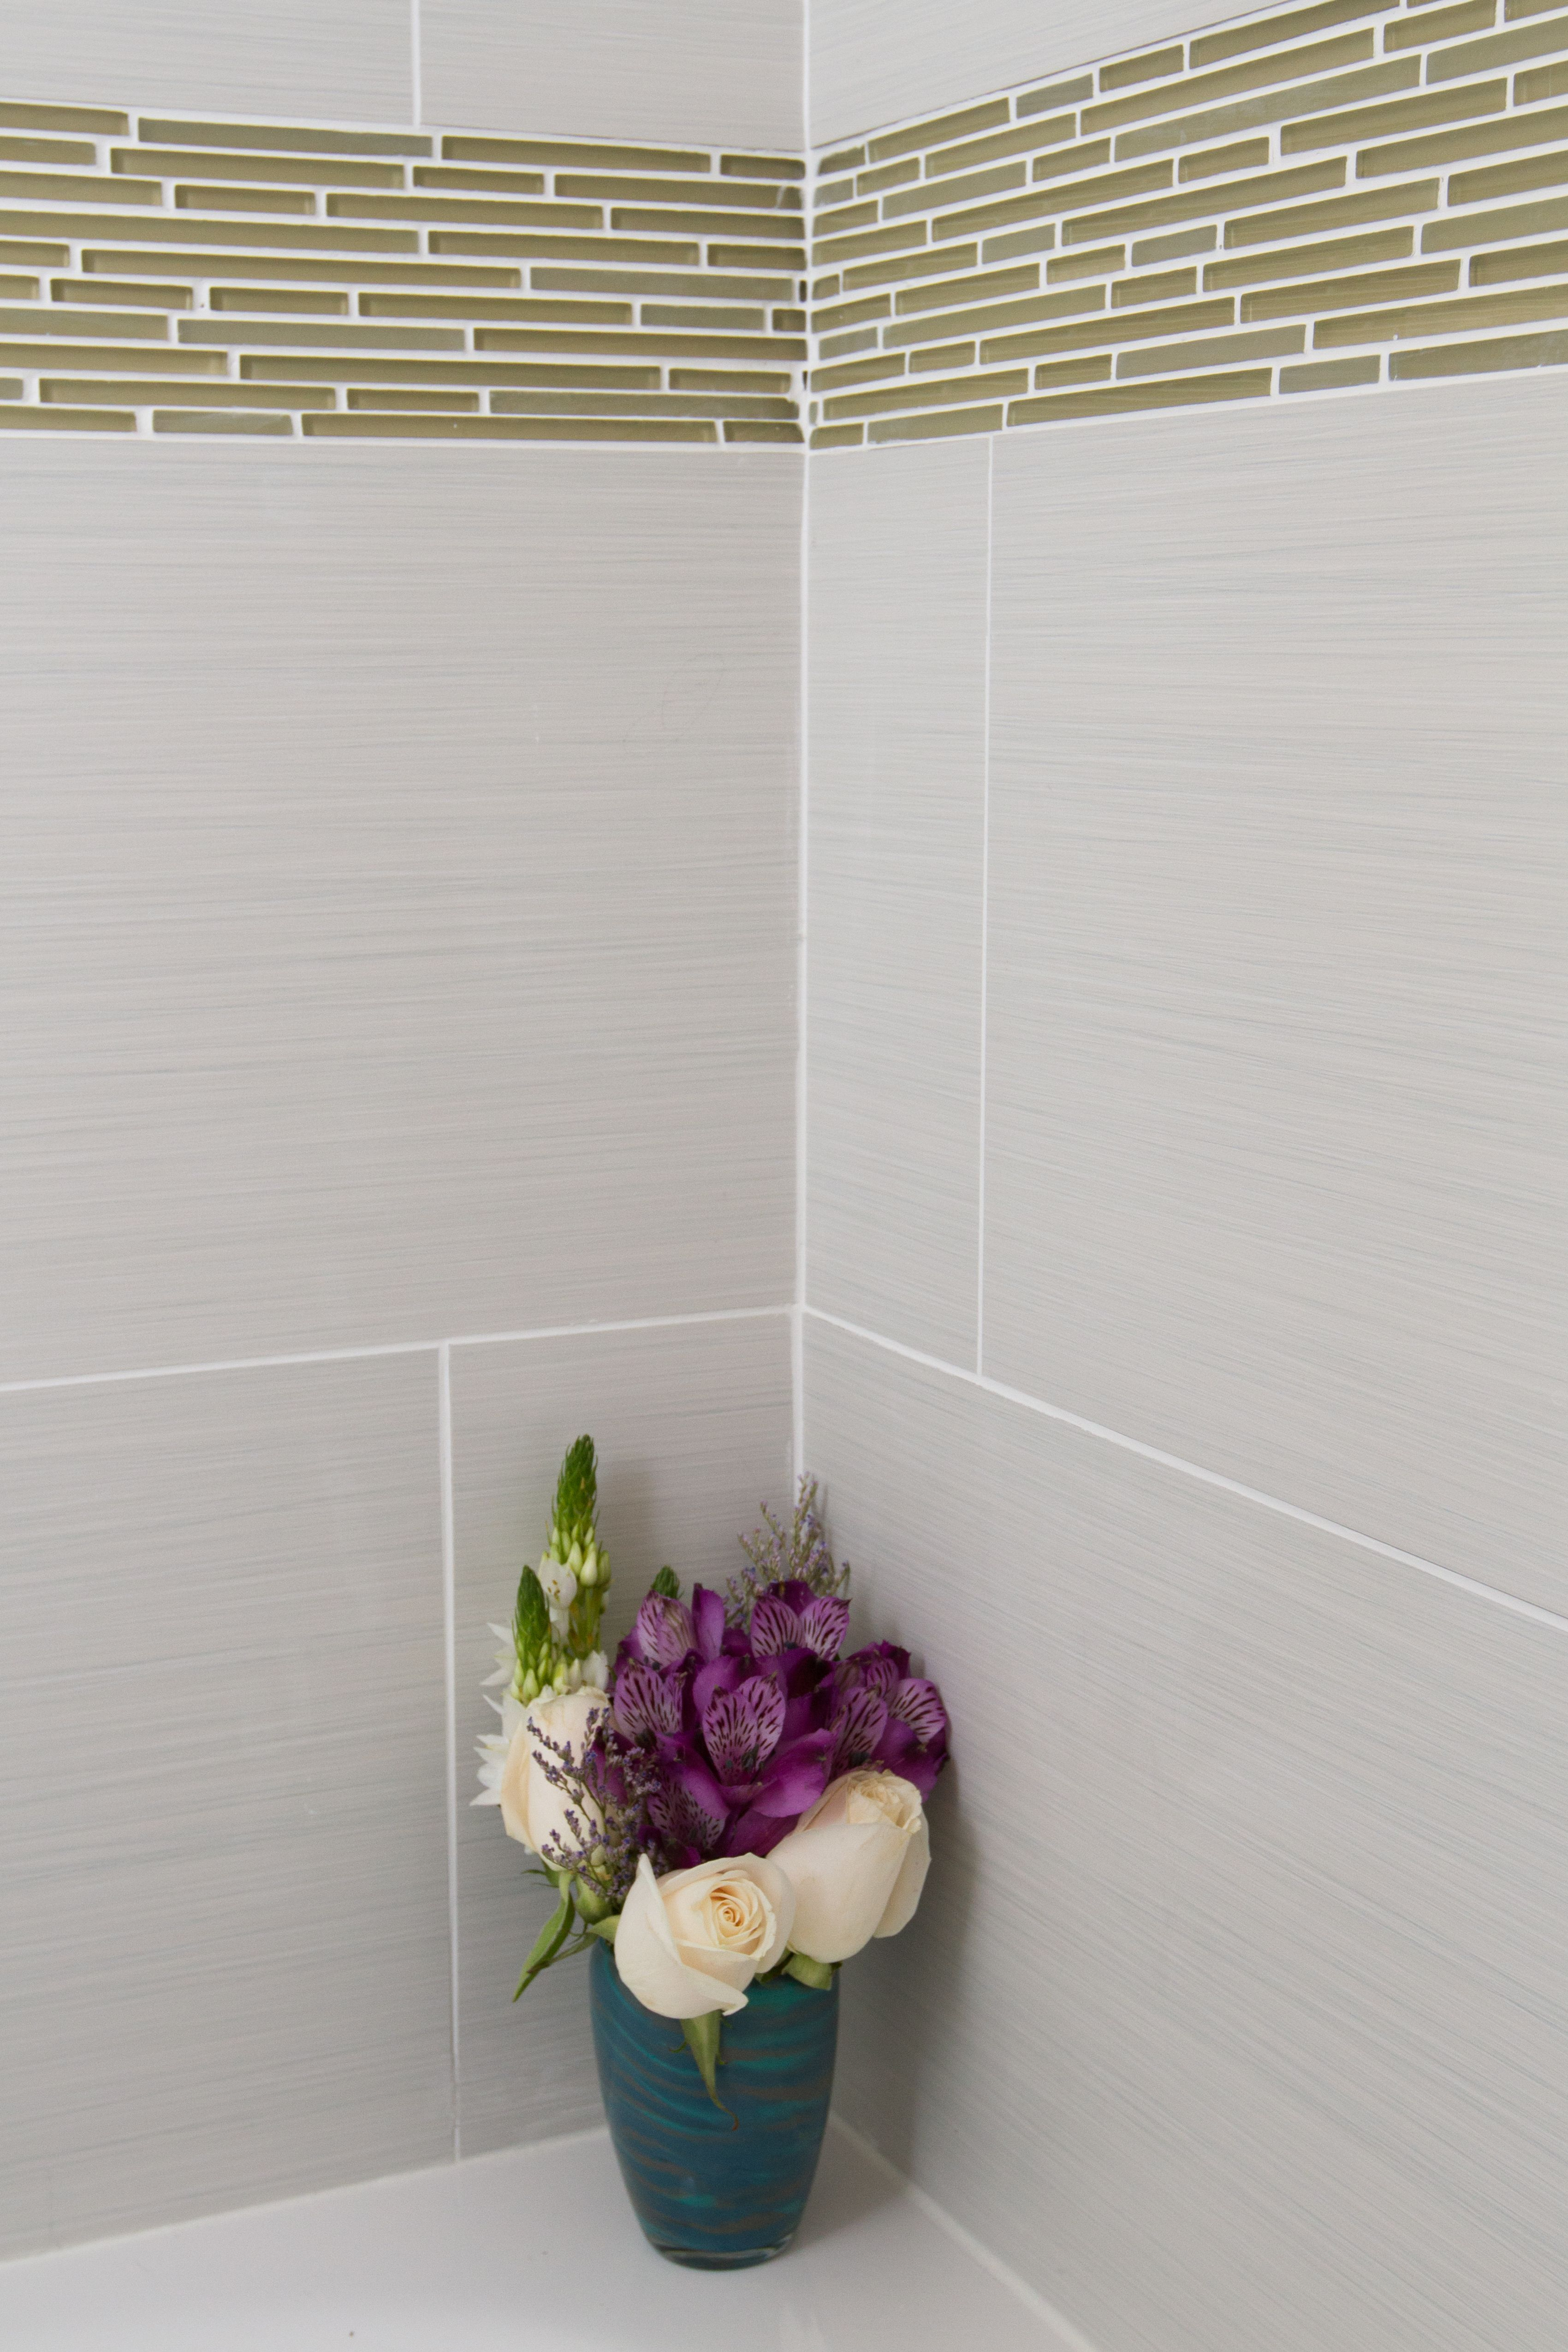 Decorative Accent Tiles For Bathroom Amazing Bathroom  Shower Tile  Blanc Linen P685 Accent Tile  Caprice Inspiration